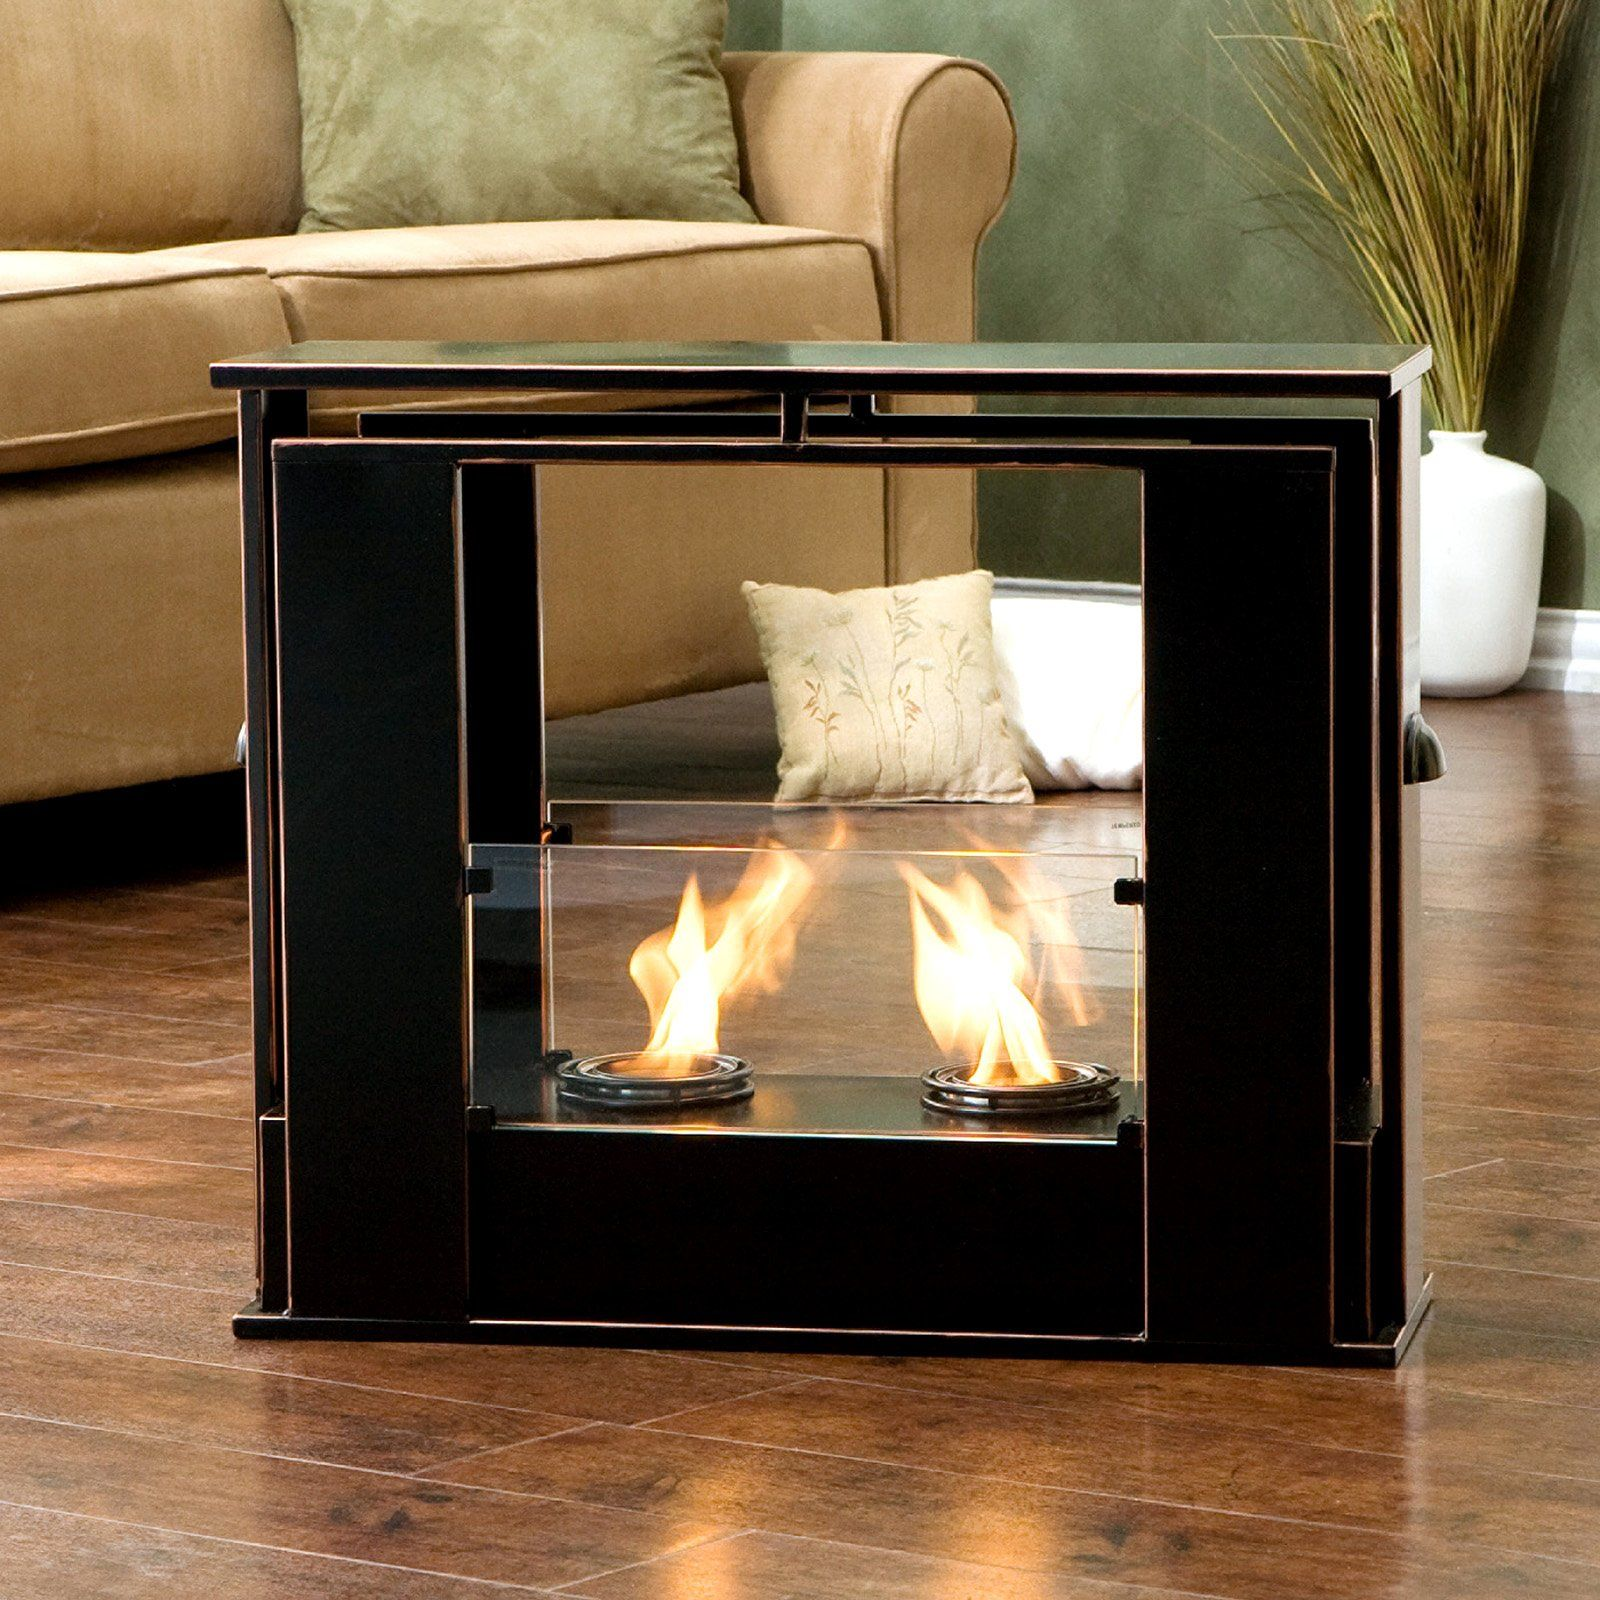 Southern Enterprises Portable Indoor Outdoor Fireplace Enjoy